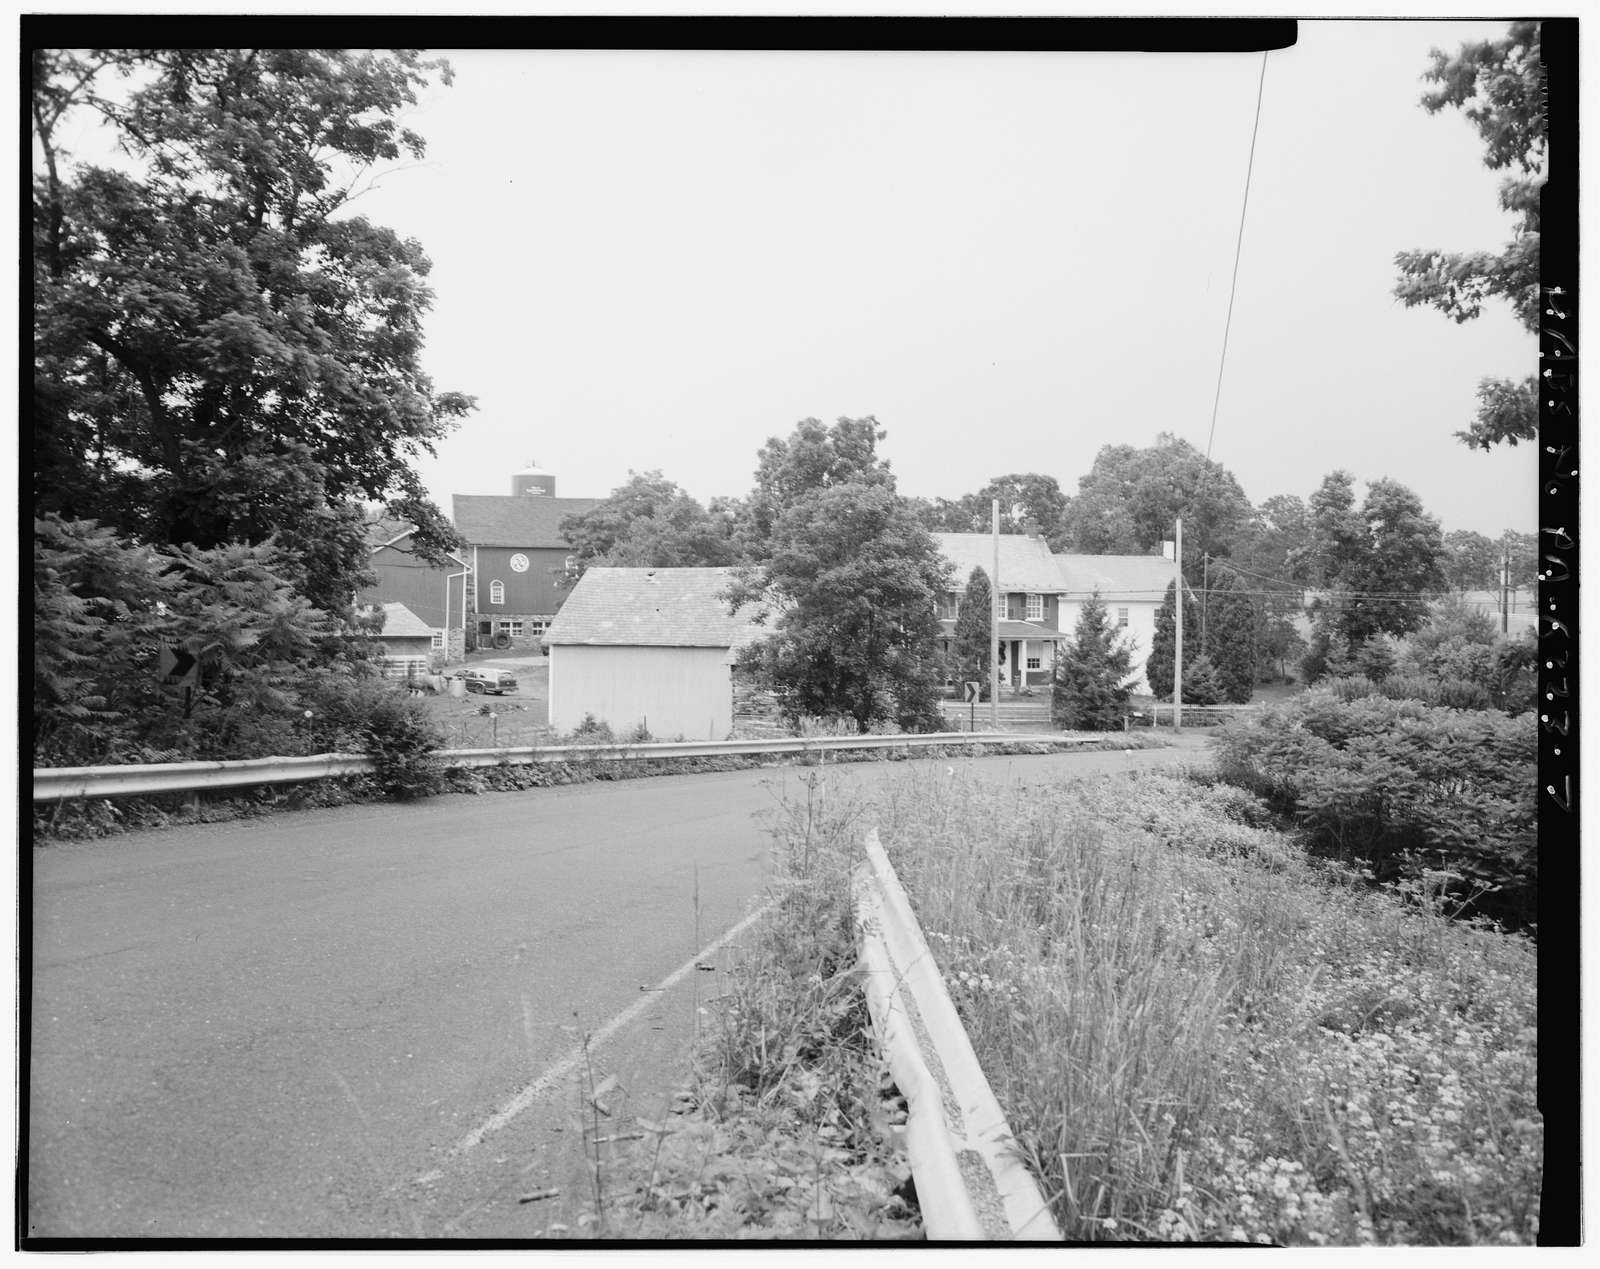 Meadowbrook Farm, Slifer Log Kitchen, 2655 Slifer Valley Road, Springtown, Bucks County, PA